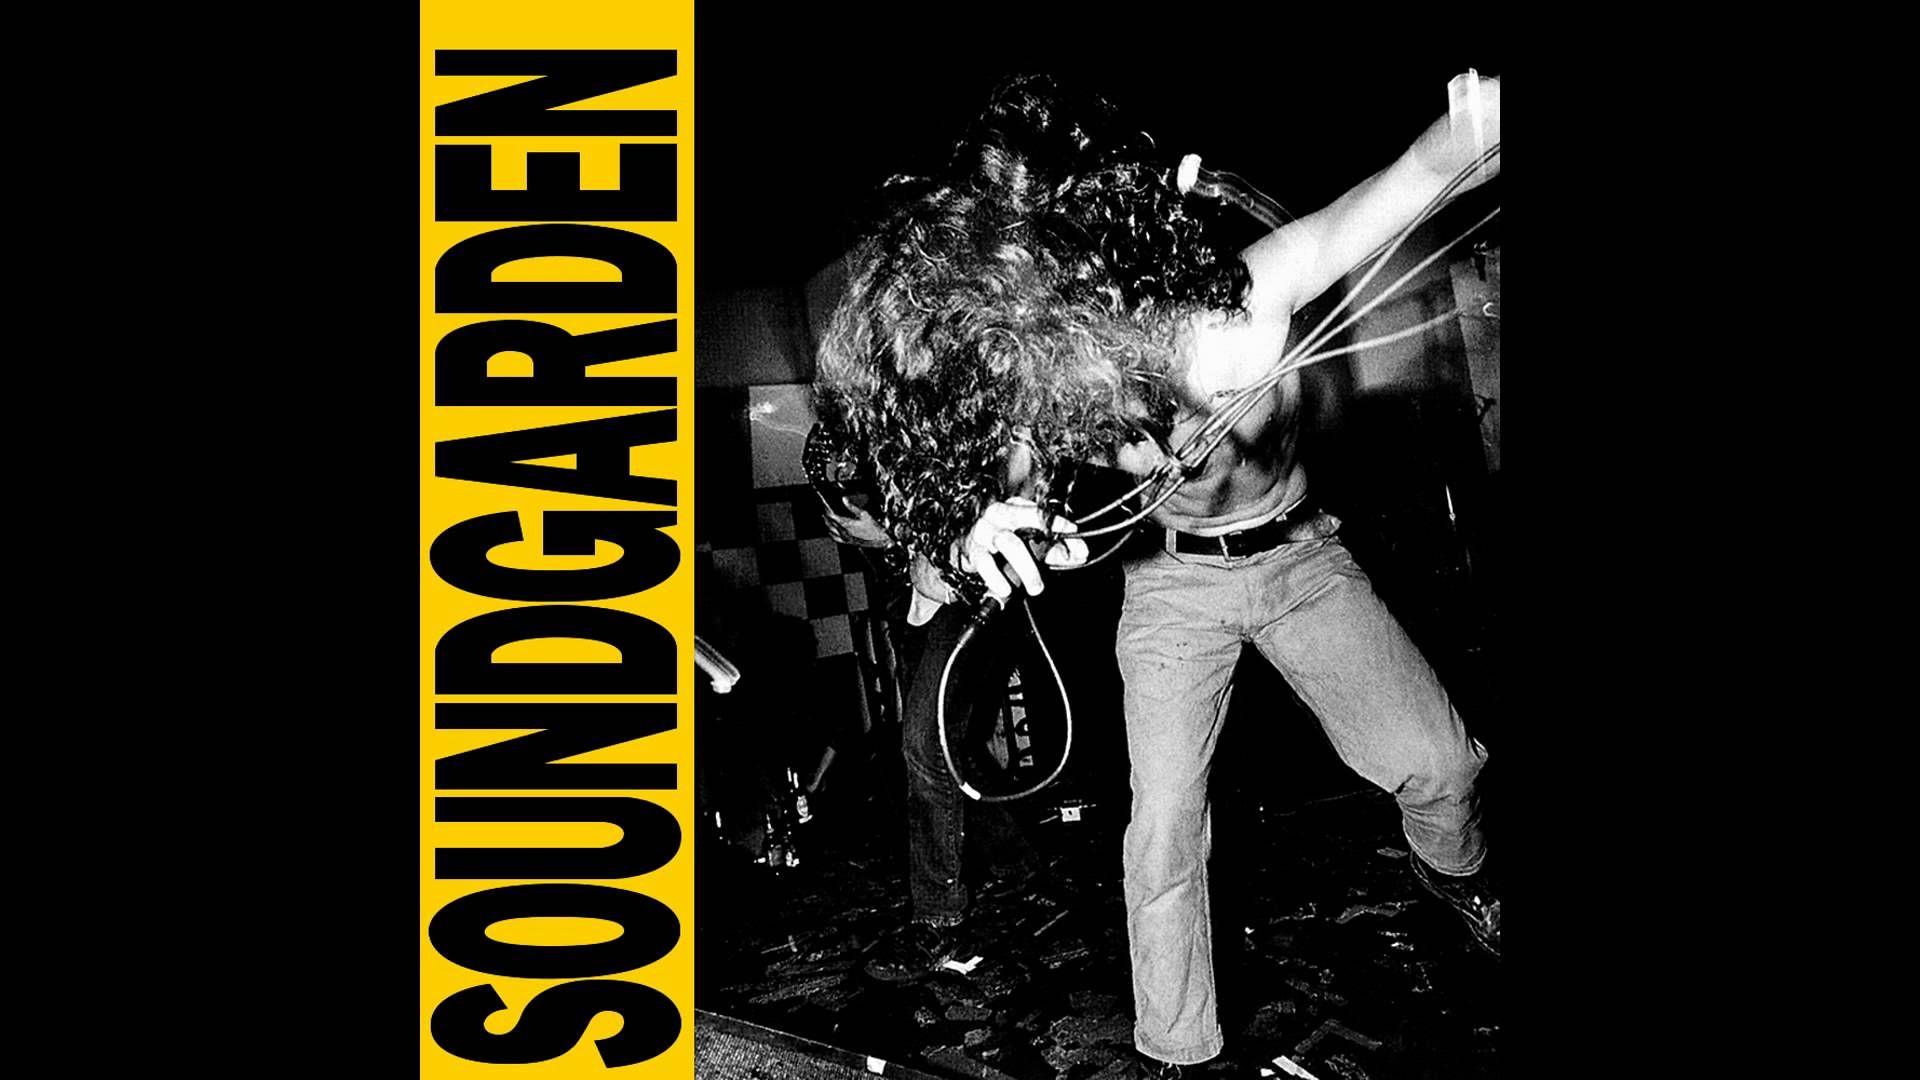 Gallery images and information soundgarden badmotorfinger tattoo - Soundgarden Louder Than Love Full Album